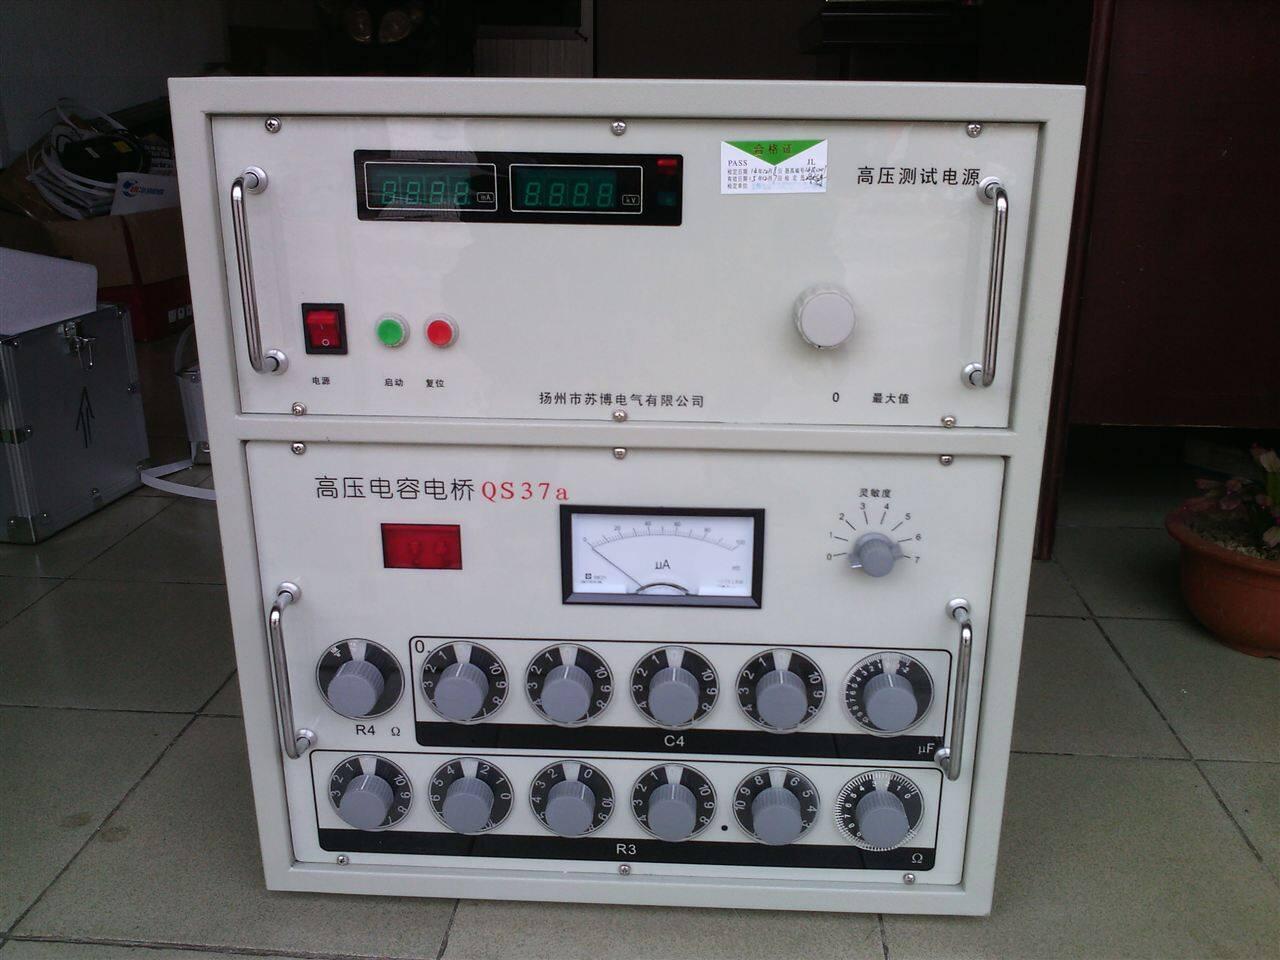 Mpa 尺寸重量 长×宽×高(mm)400×300×400 重量15kg TE120A型液体电极专用控温仪  TE120A型液体电极专用控温仪是新一代的绝缘油测量电极的专用控温智能化装置,可与国际通用的圆柱型绝缘油电极配套使用。保证绝缘油在规定时间内到达所需温度,并能恒定较长时间,以便通过高压电桥对绝缘油进行介质损耗因素(tgδ)、相对介电常数(er)进行精密测量。本产品温度显示采用内外温同时显示,加热控制采用两片单片机分别对内、外加热器进行加热